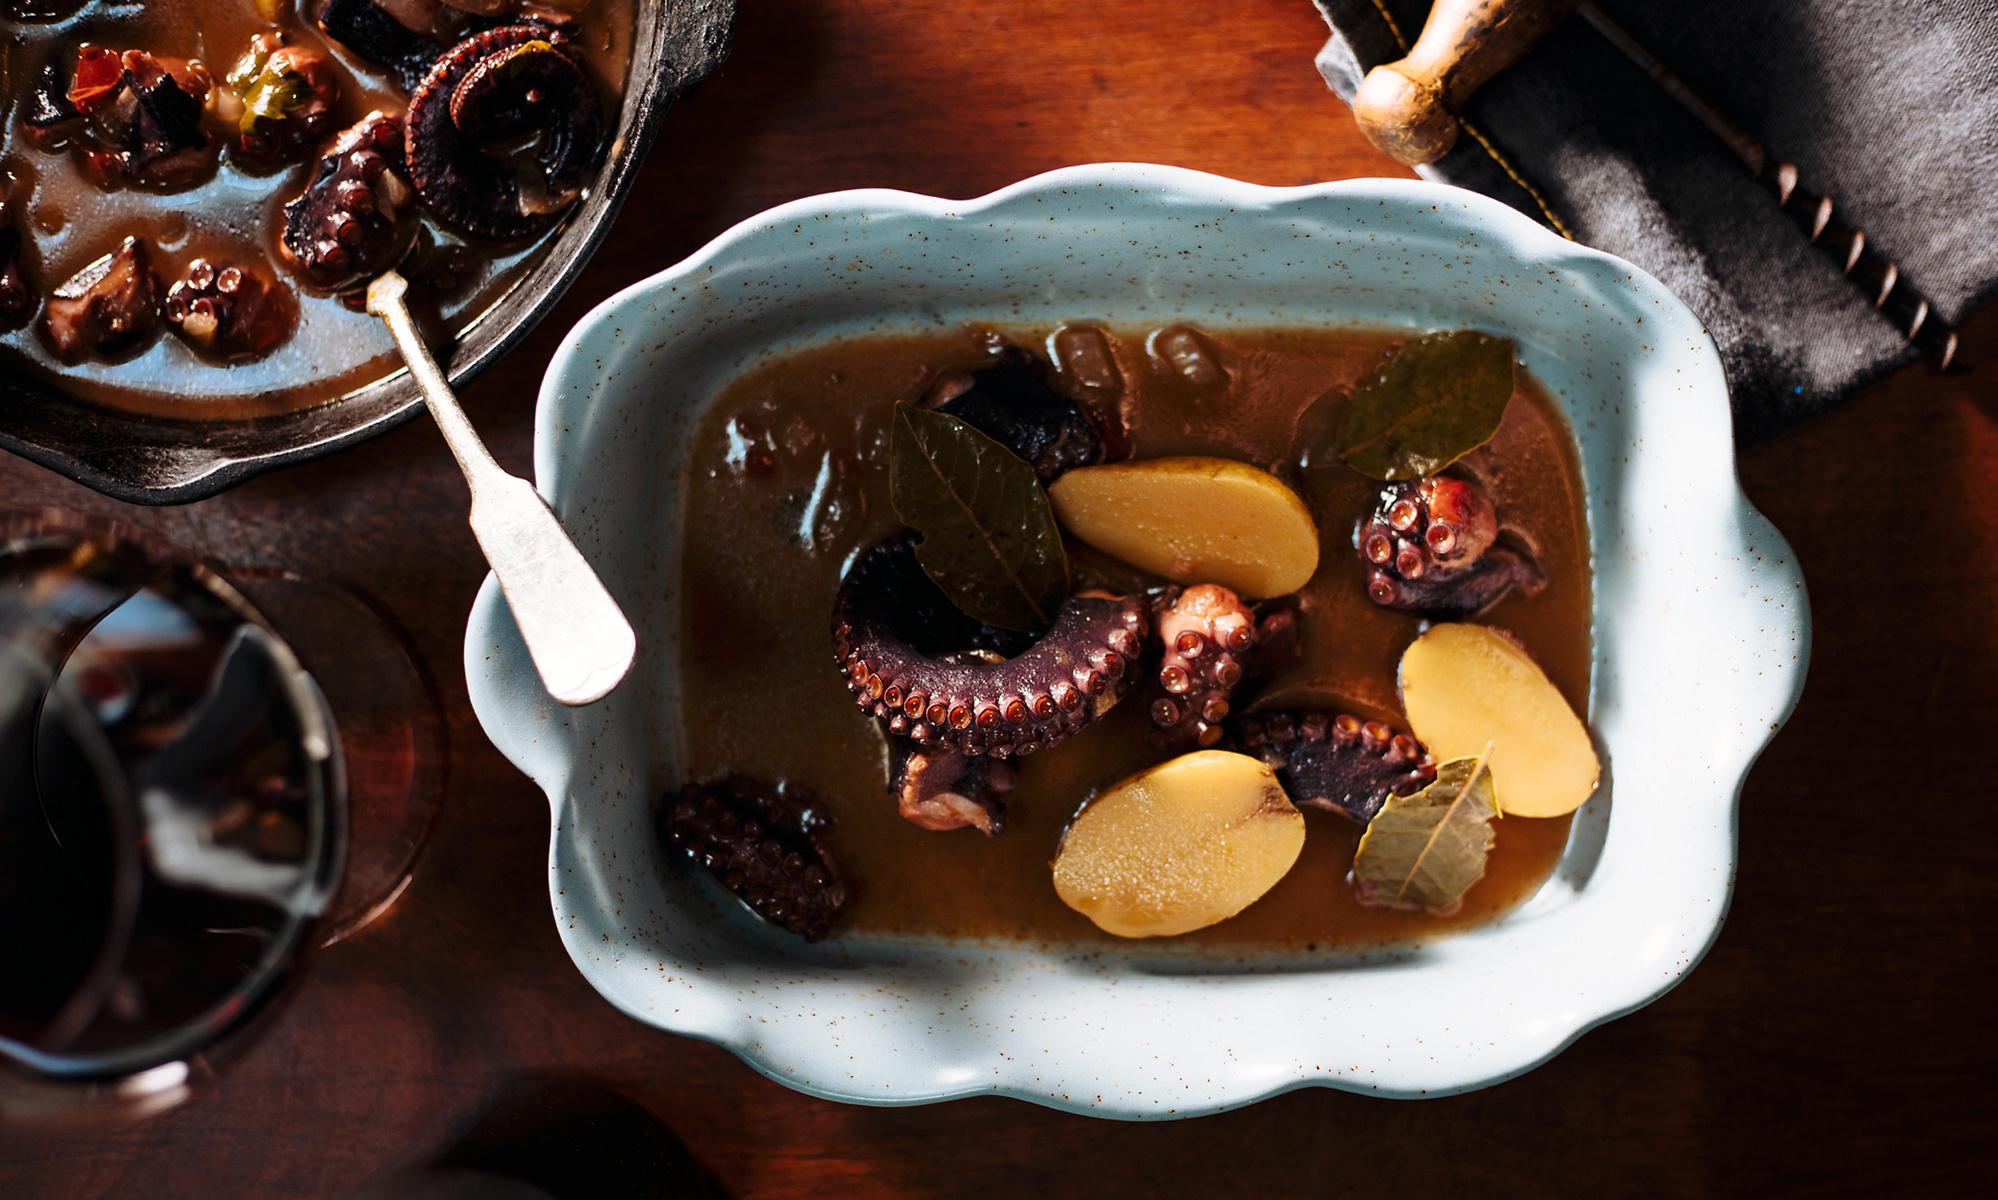 Portuguese octopus stew